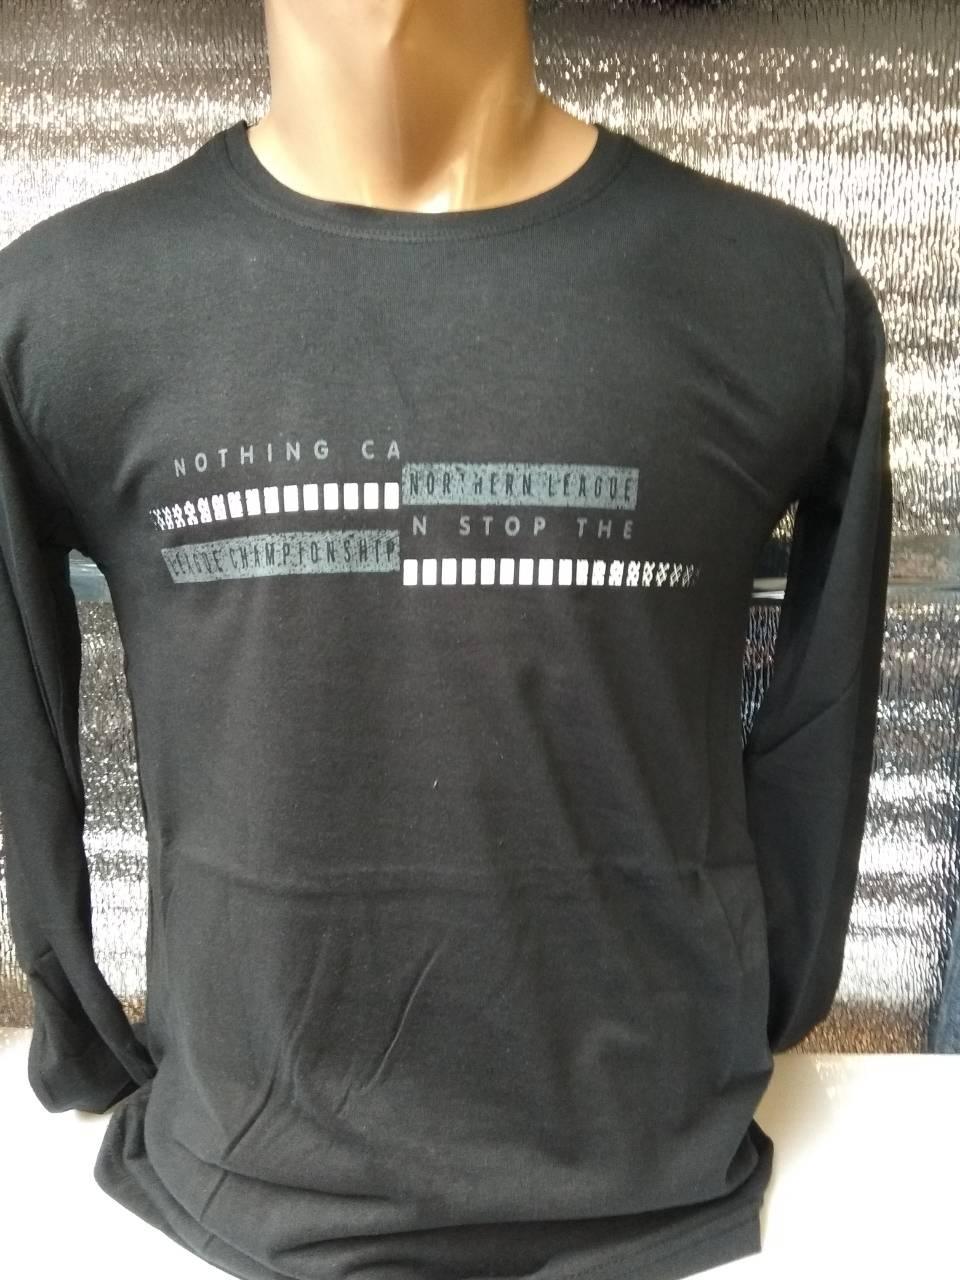 Мужская футболка с длинным рукавом Nothing will stop me Турция р. M, L, XL, XXL.